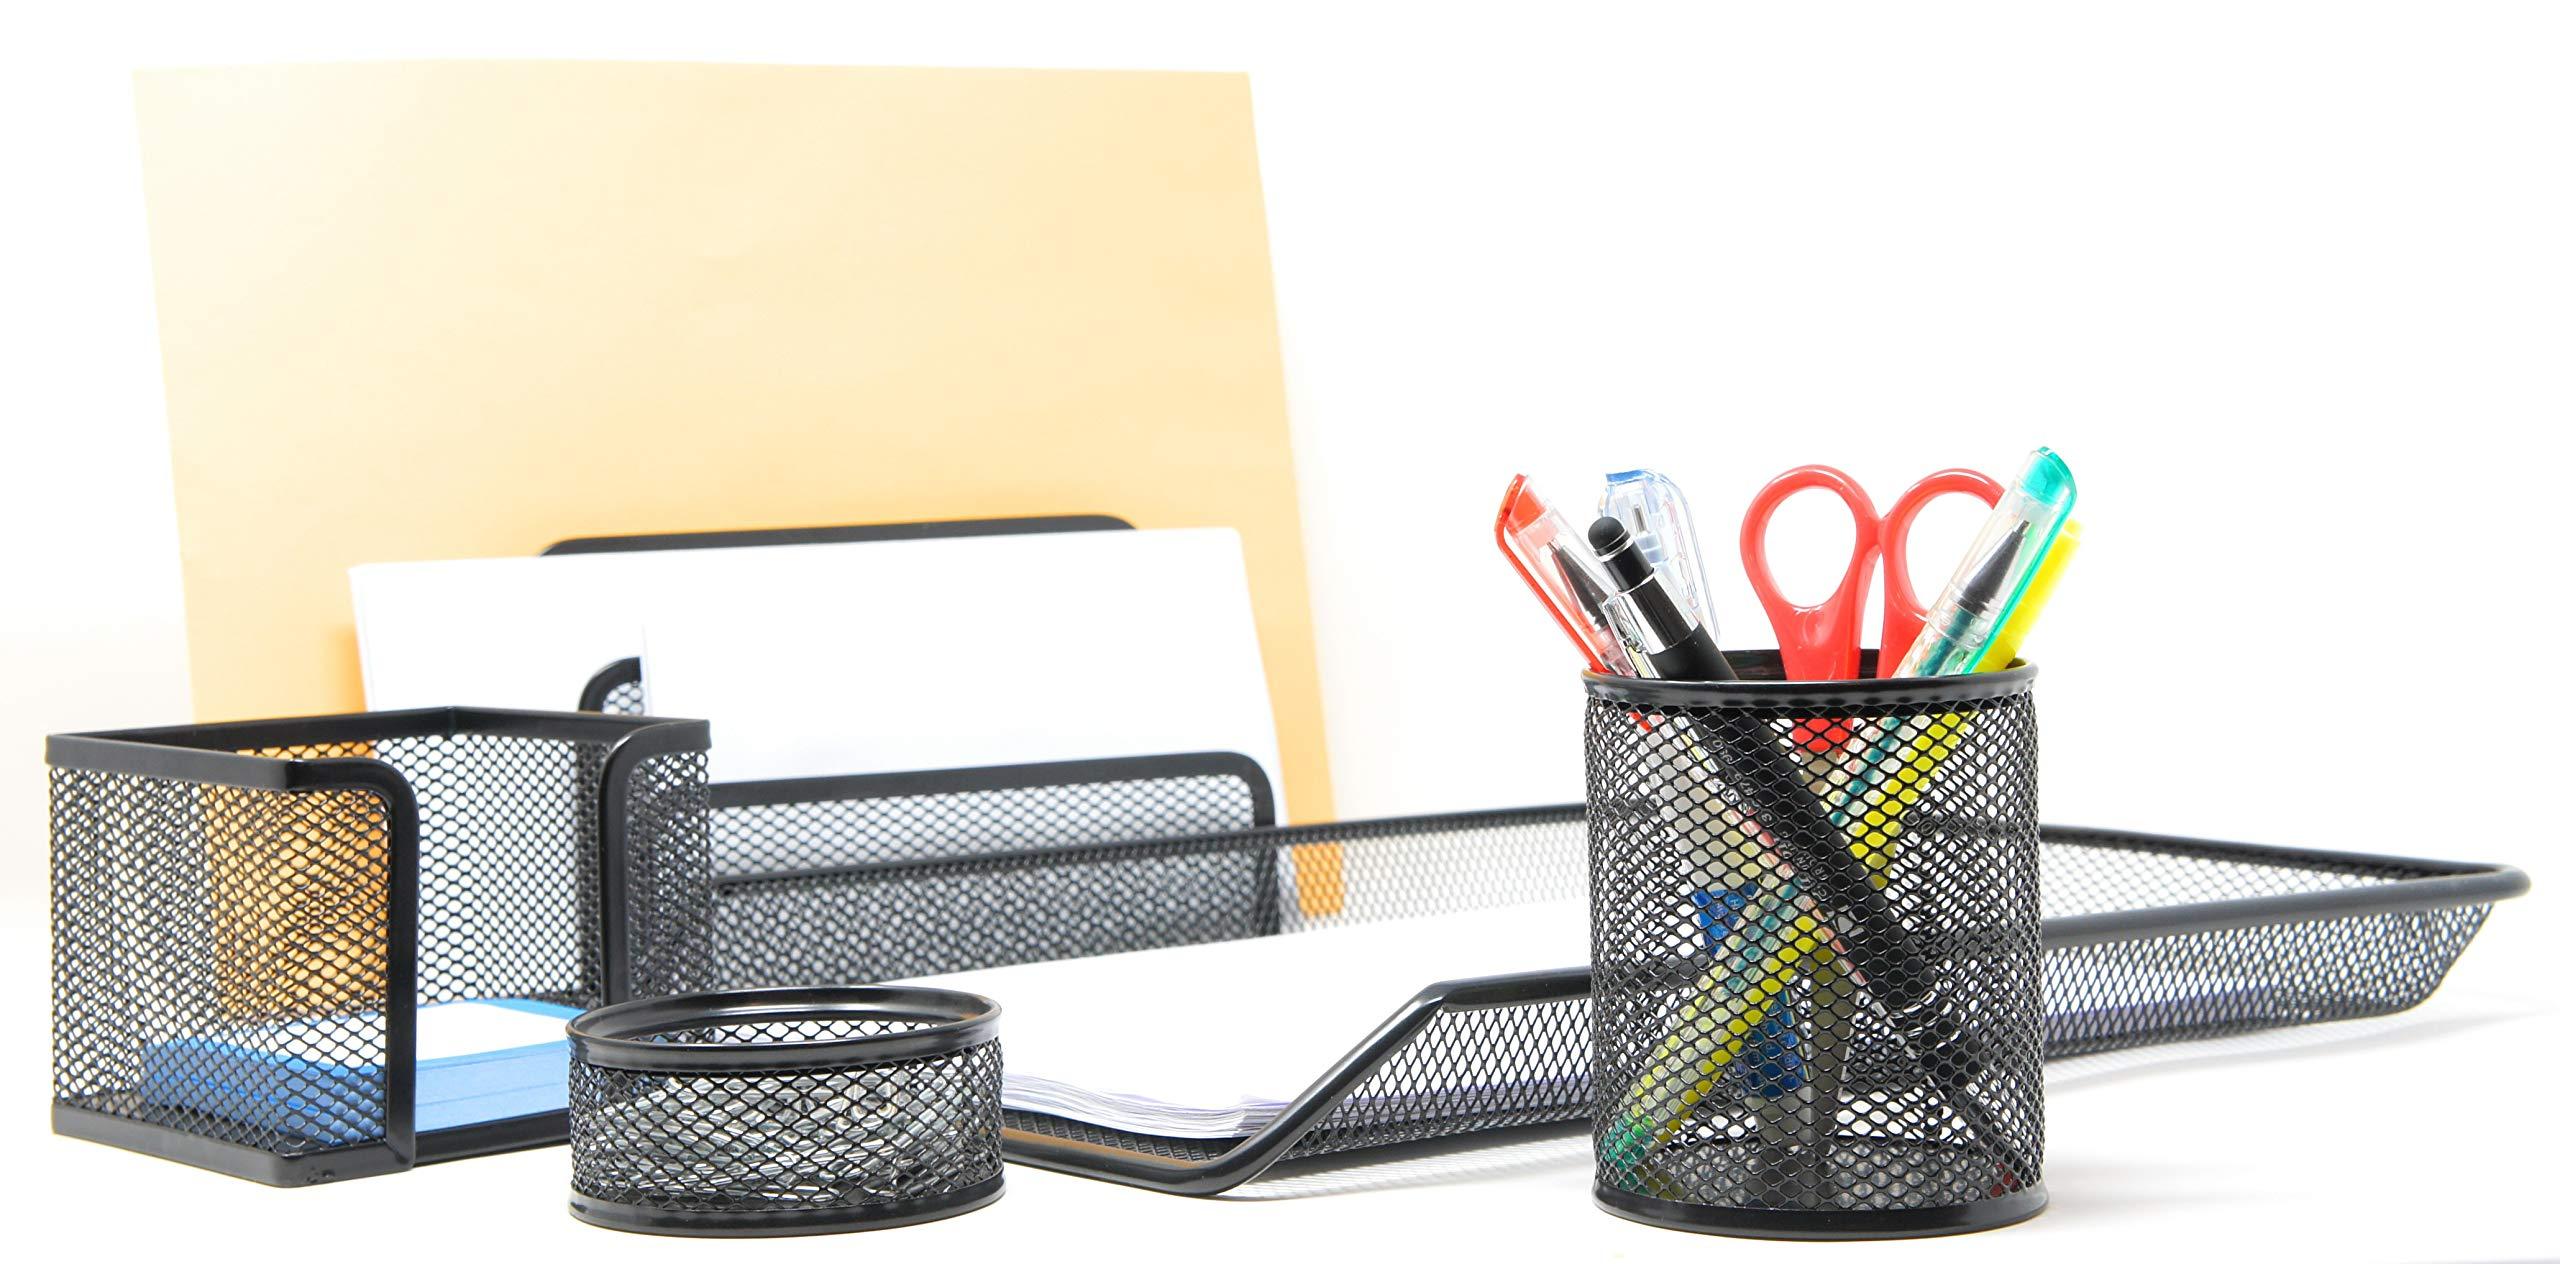 Mesh Desk Organizer Set - 5 Piece Set Black Color - Office Supply Desk Organizers (5 Pc) by Good Buy Gifts